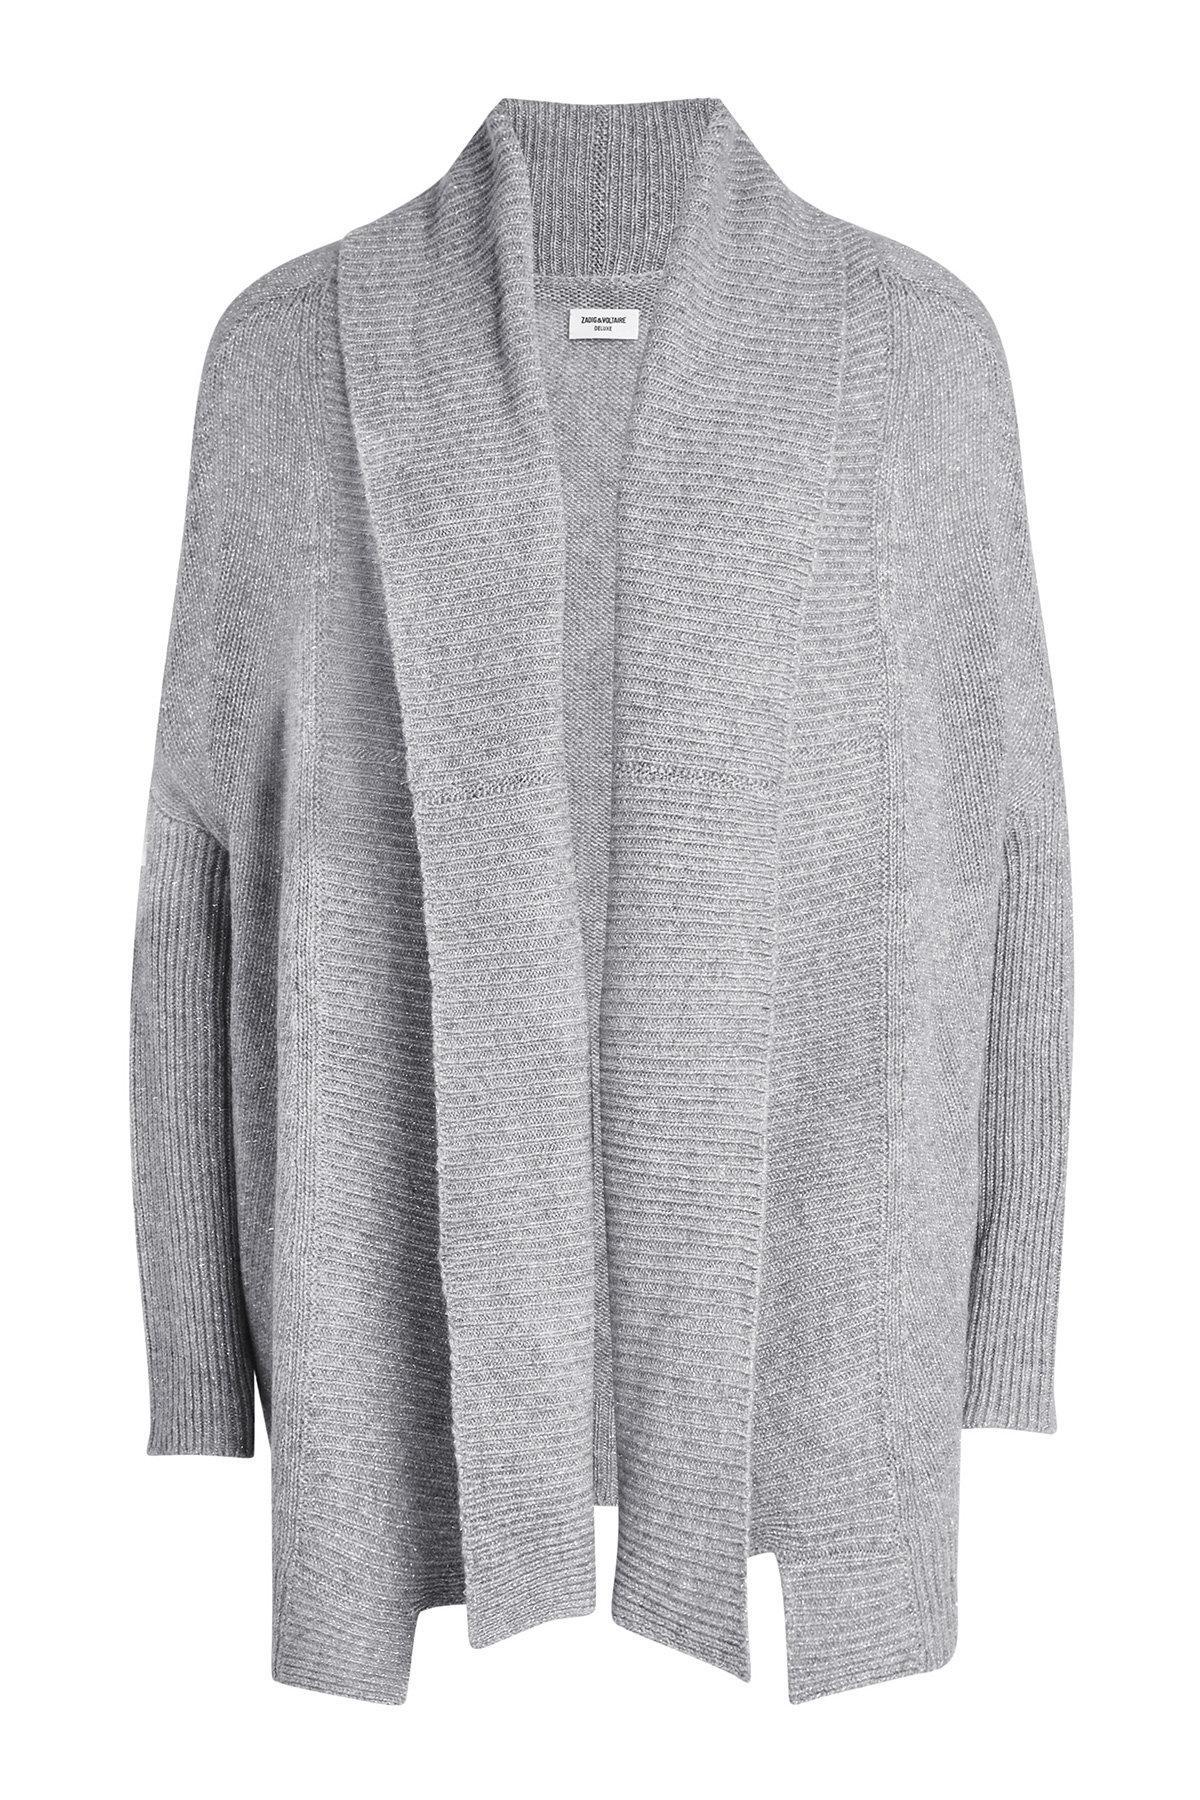 Zadig & Voltaire Cashmere Cardigan In Grey